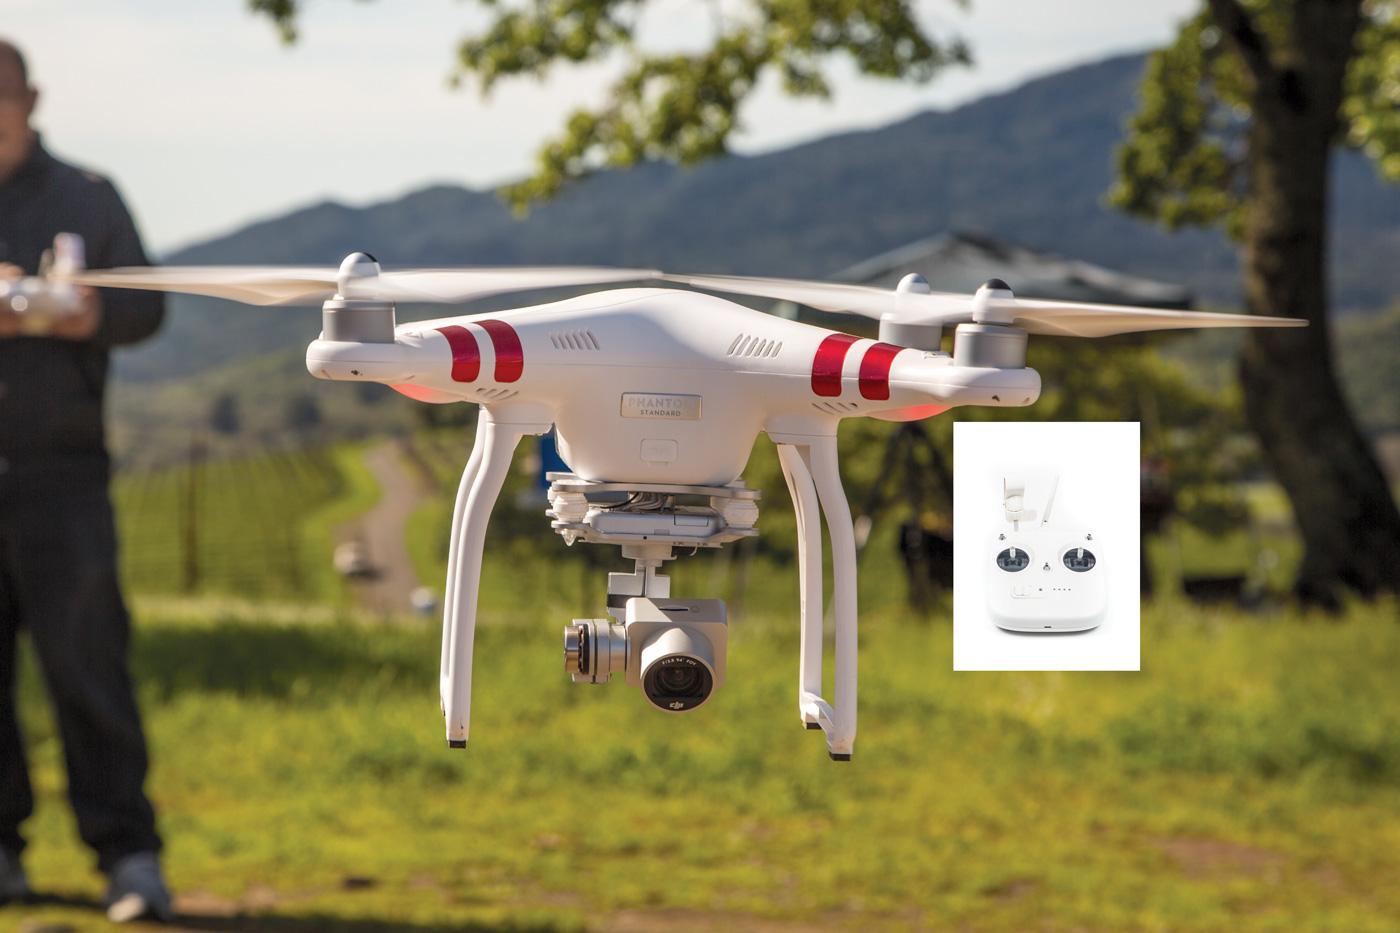 dronex pro darty